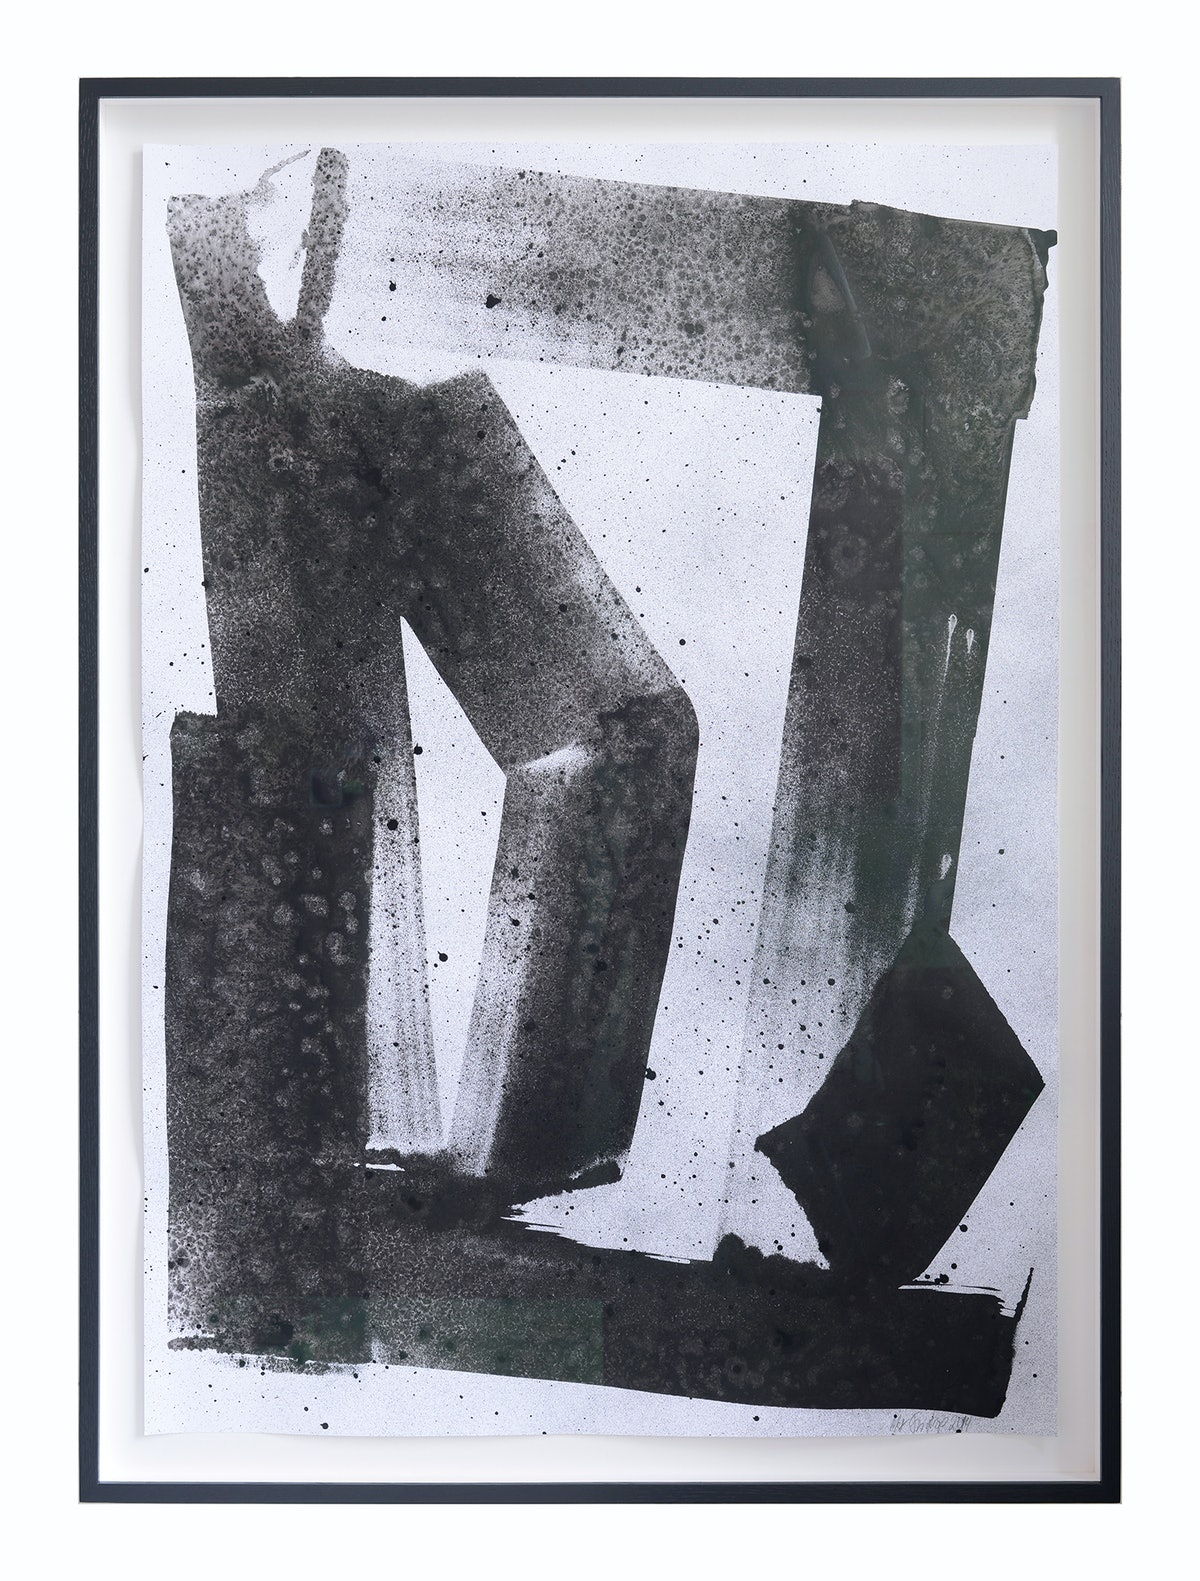 Max Frintrop's Untitled, 2014